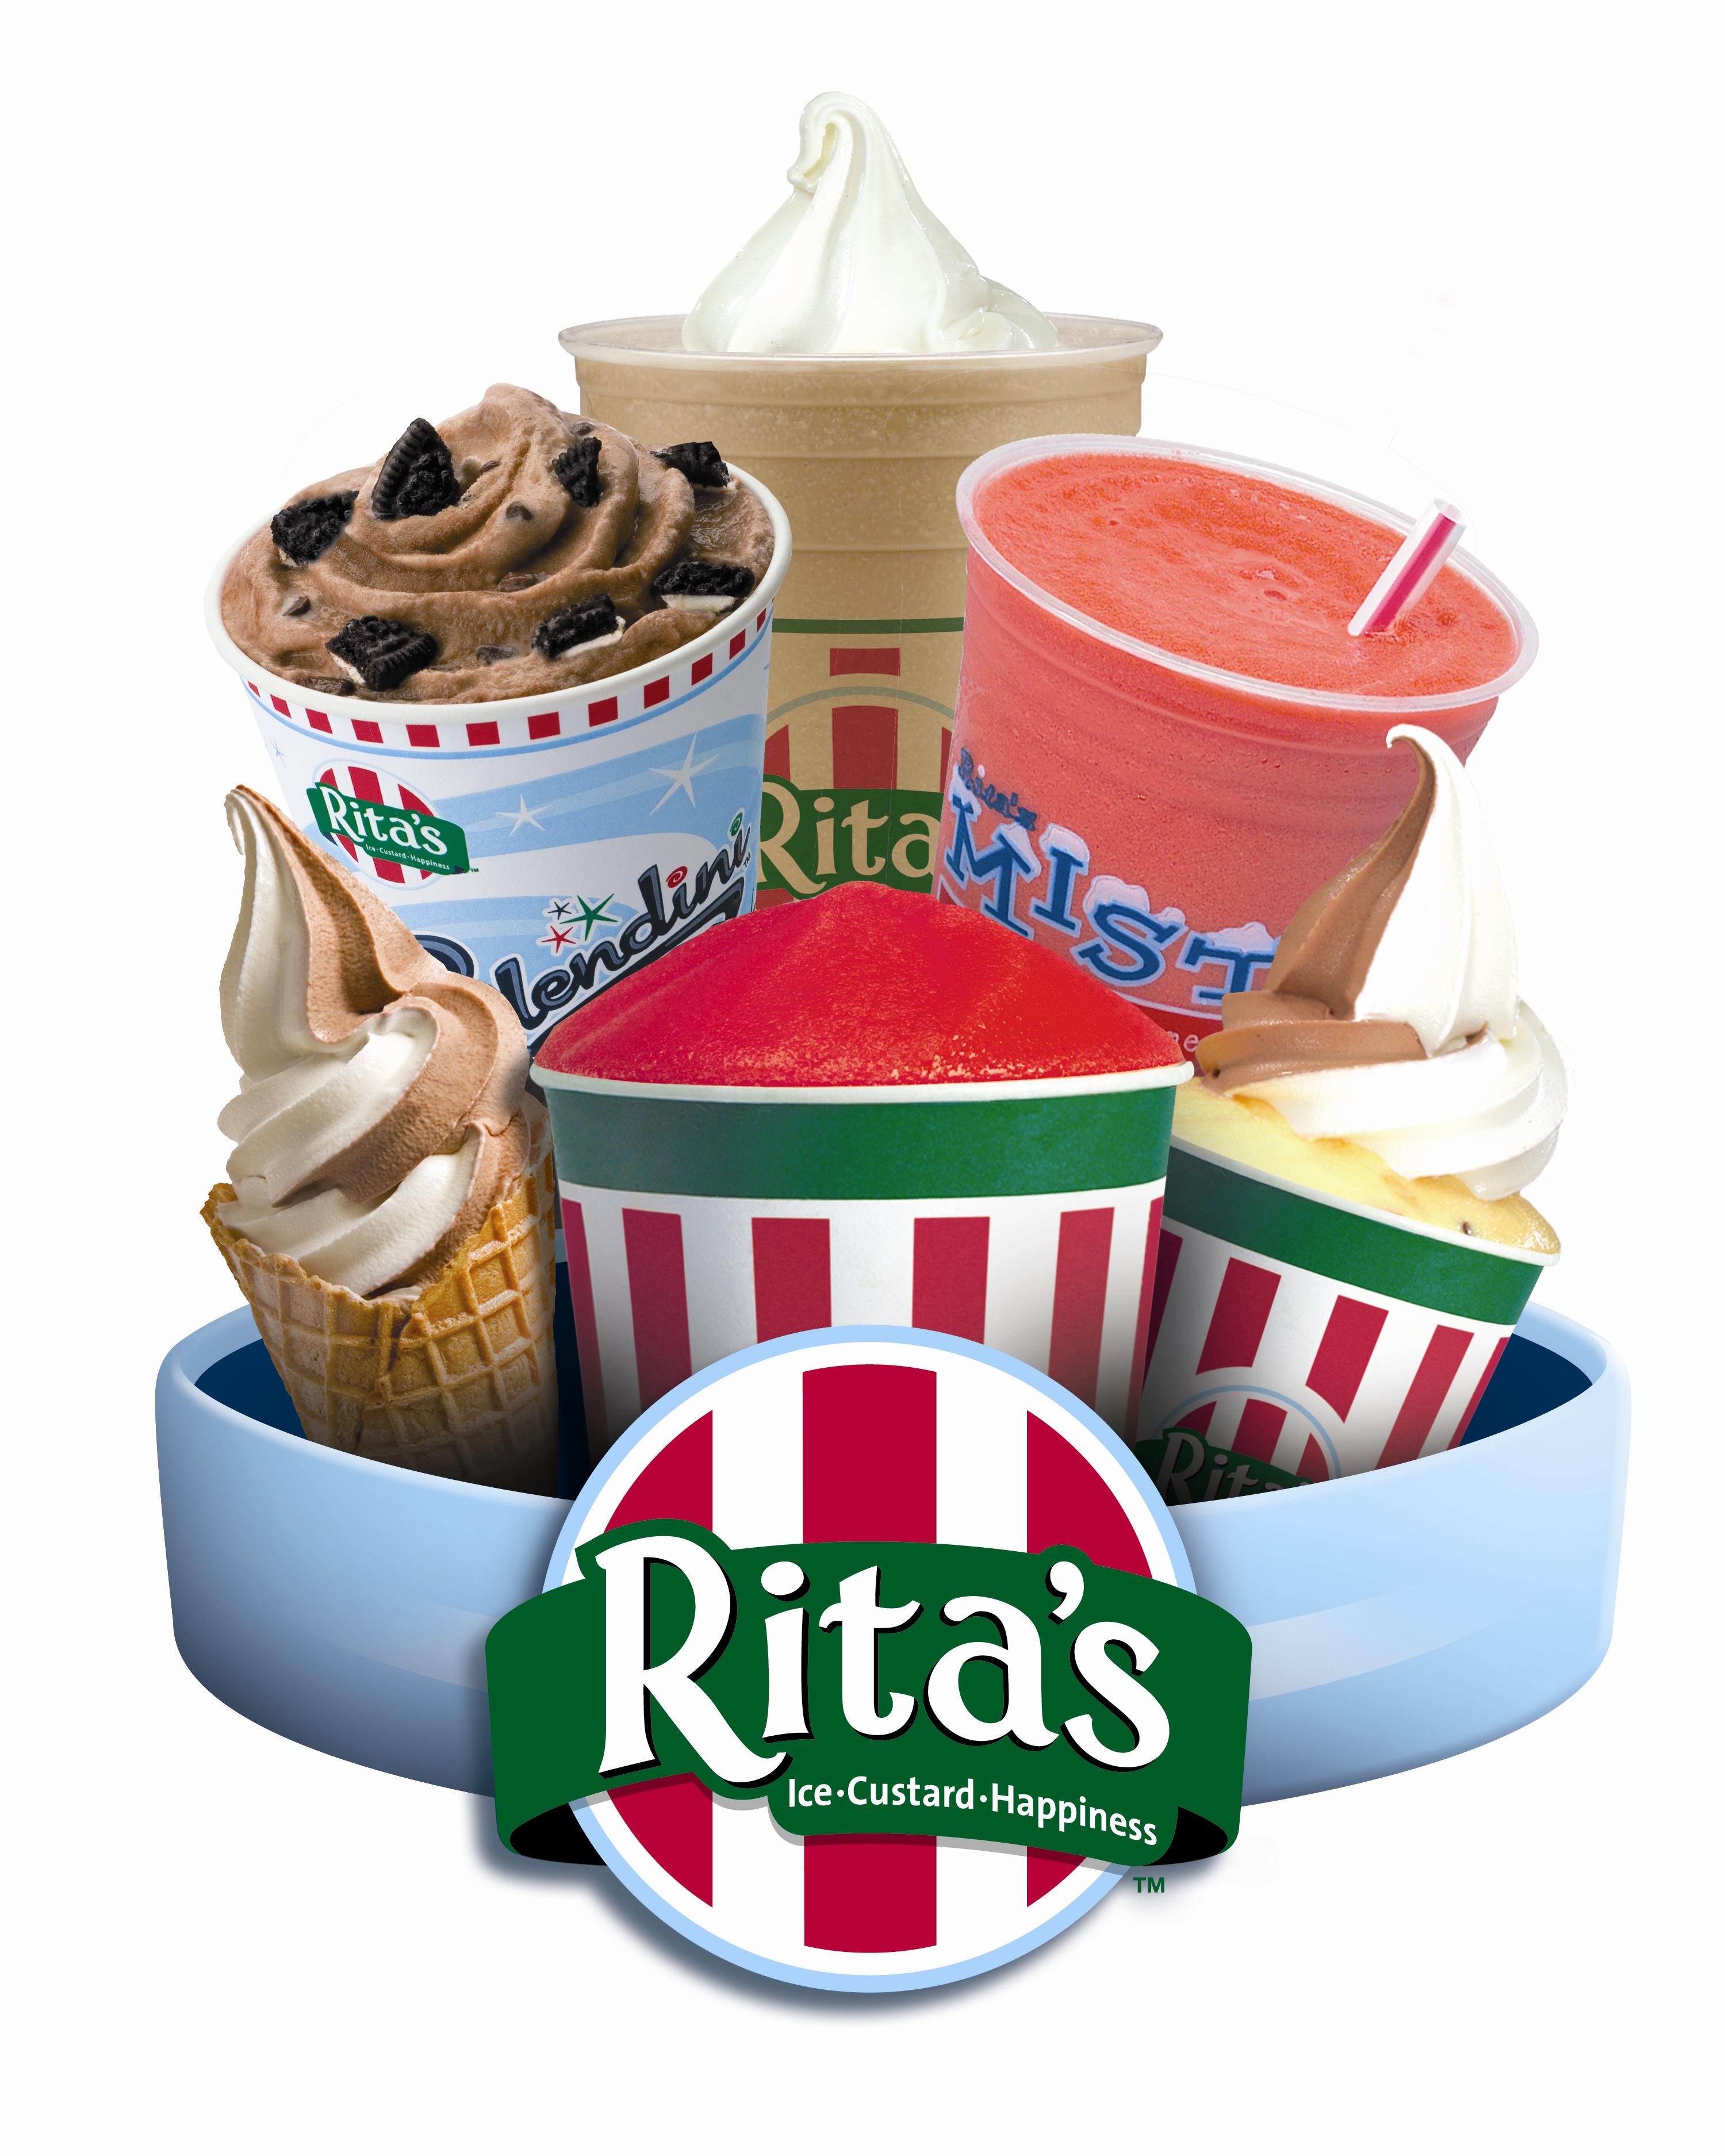 5 Days*Rita's Winter Closing*5 Days.